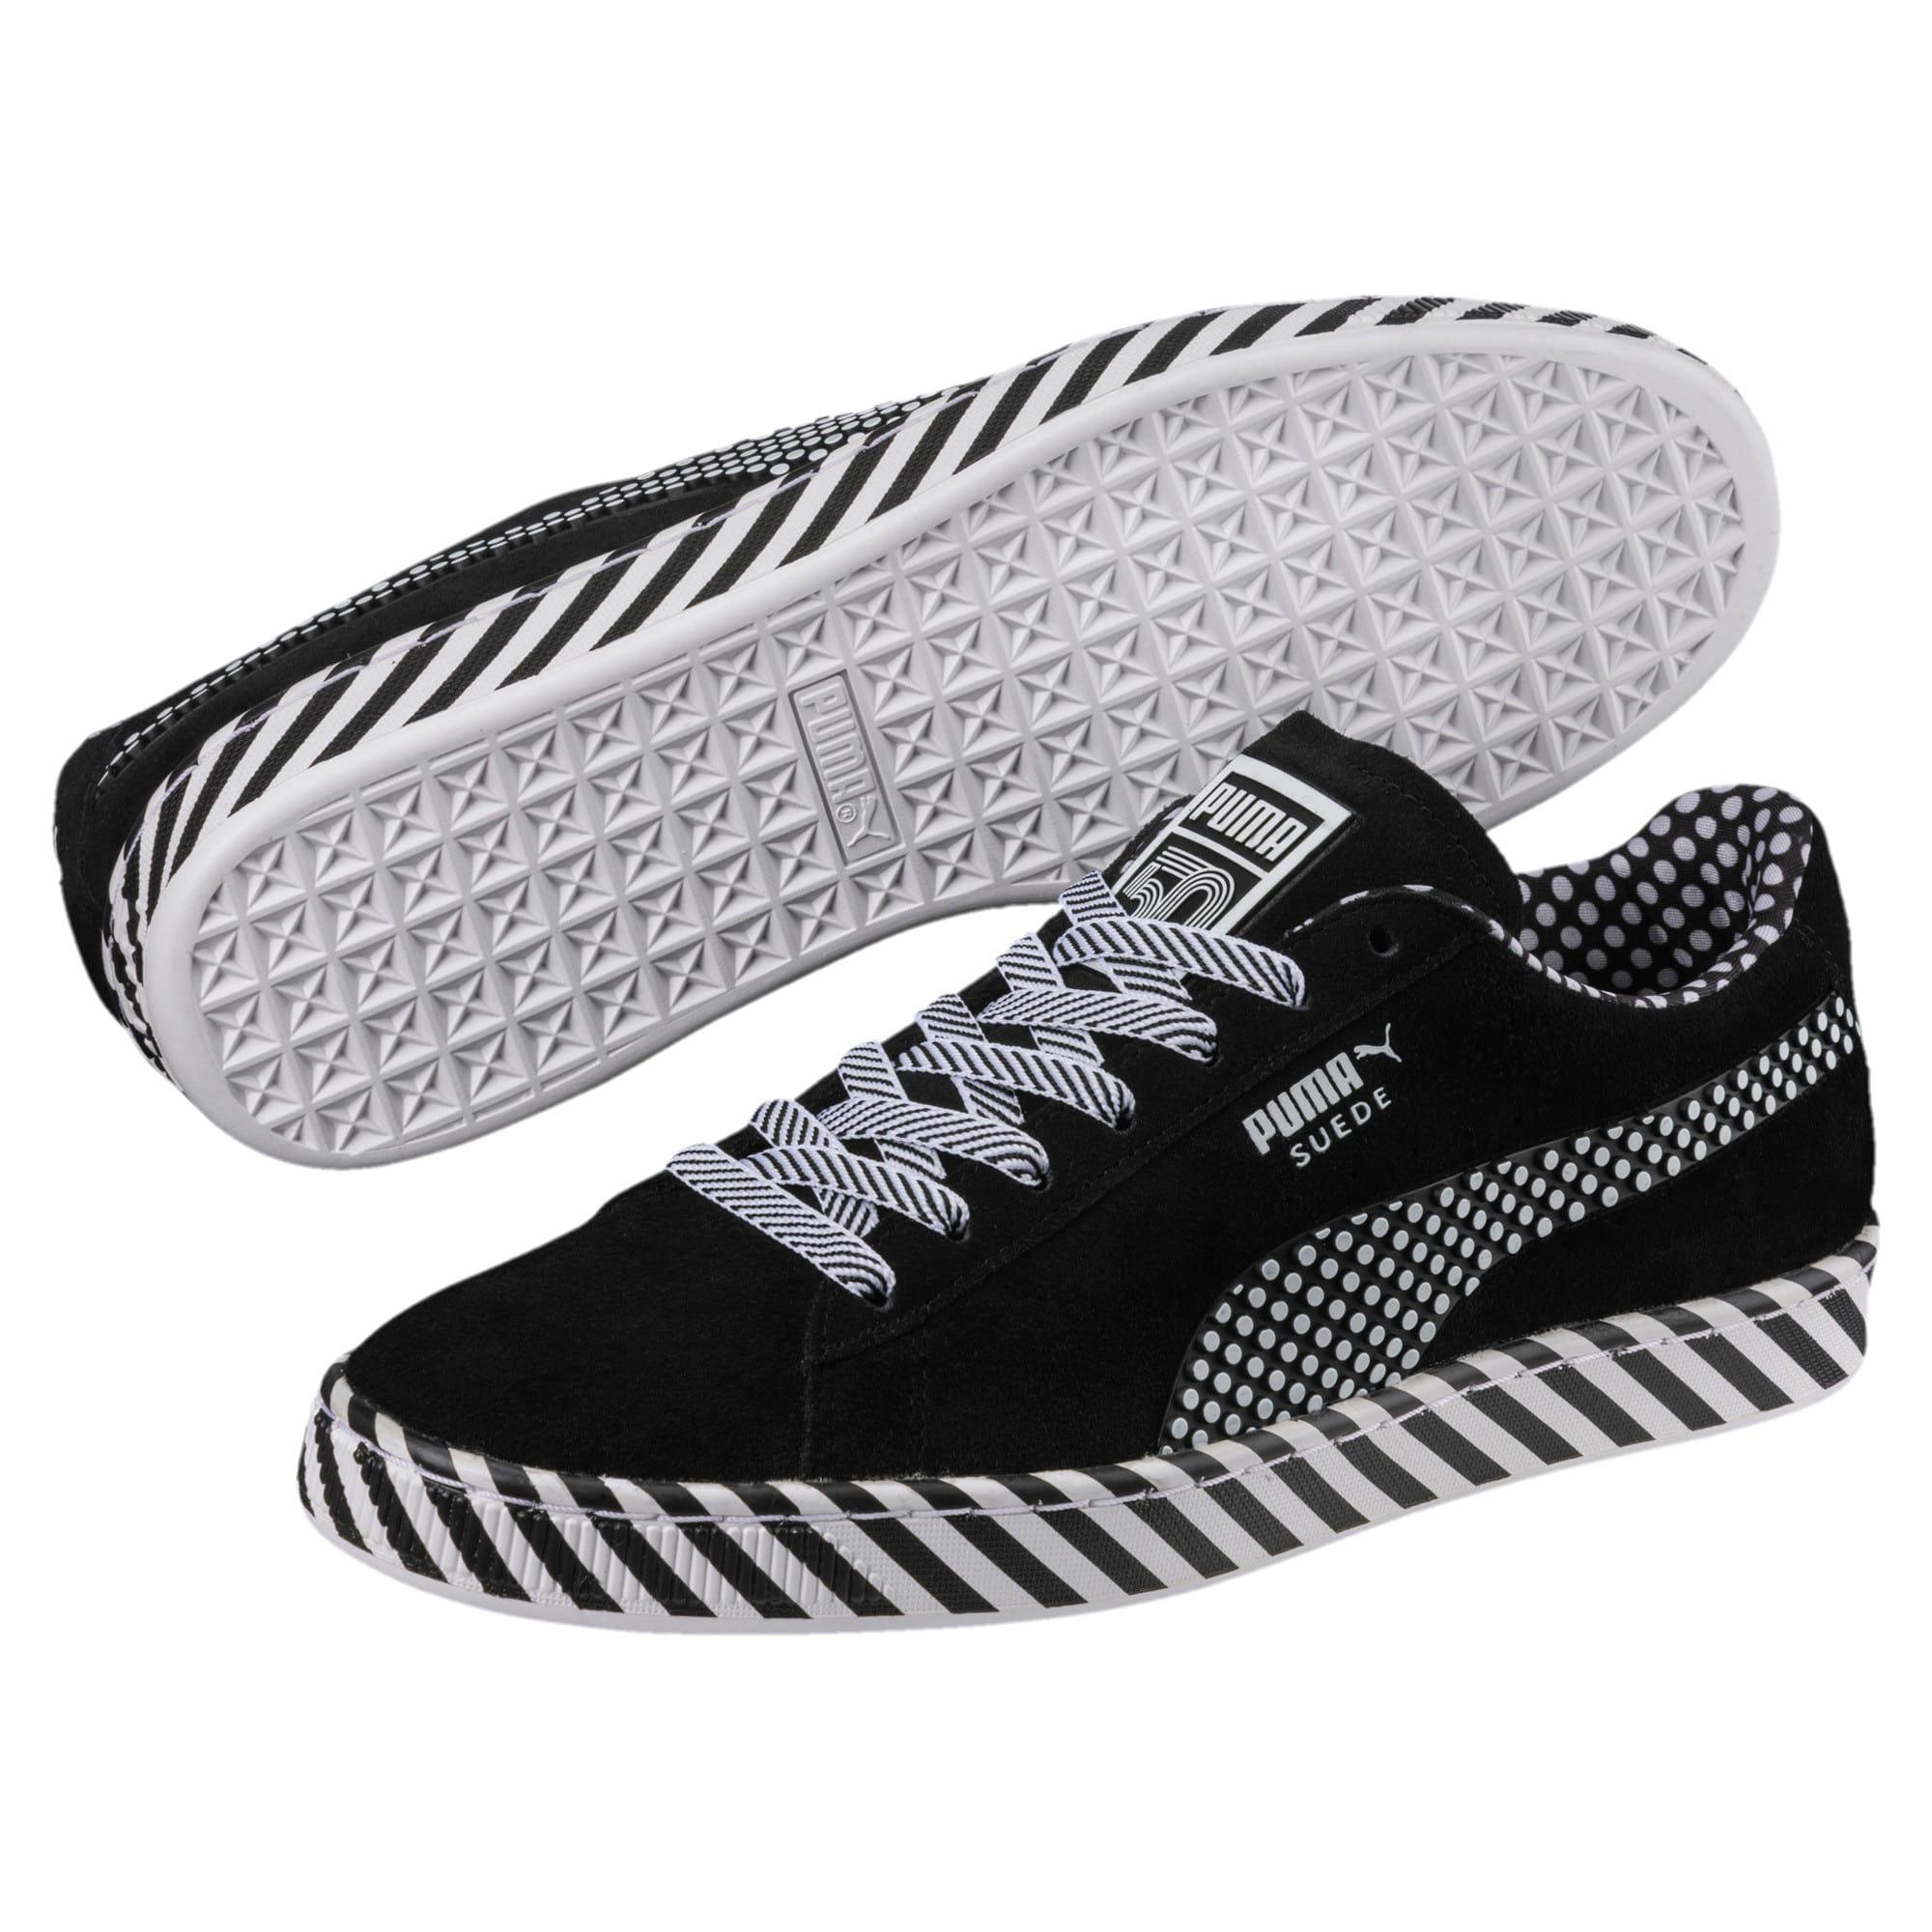 Thumbnail 2 of Suede Classic Pop Culture Sneakers, Puma Black-Puma White, medium